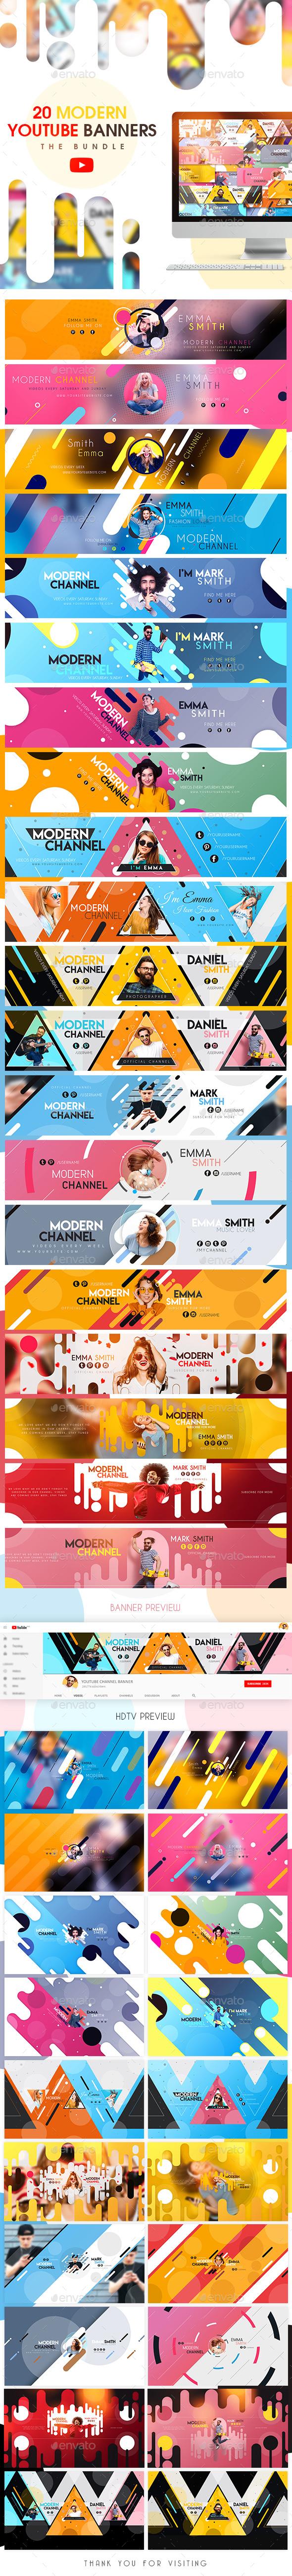 YouTube Bundle - 20 Modern Banners - YouTube Social Media